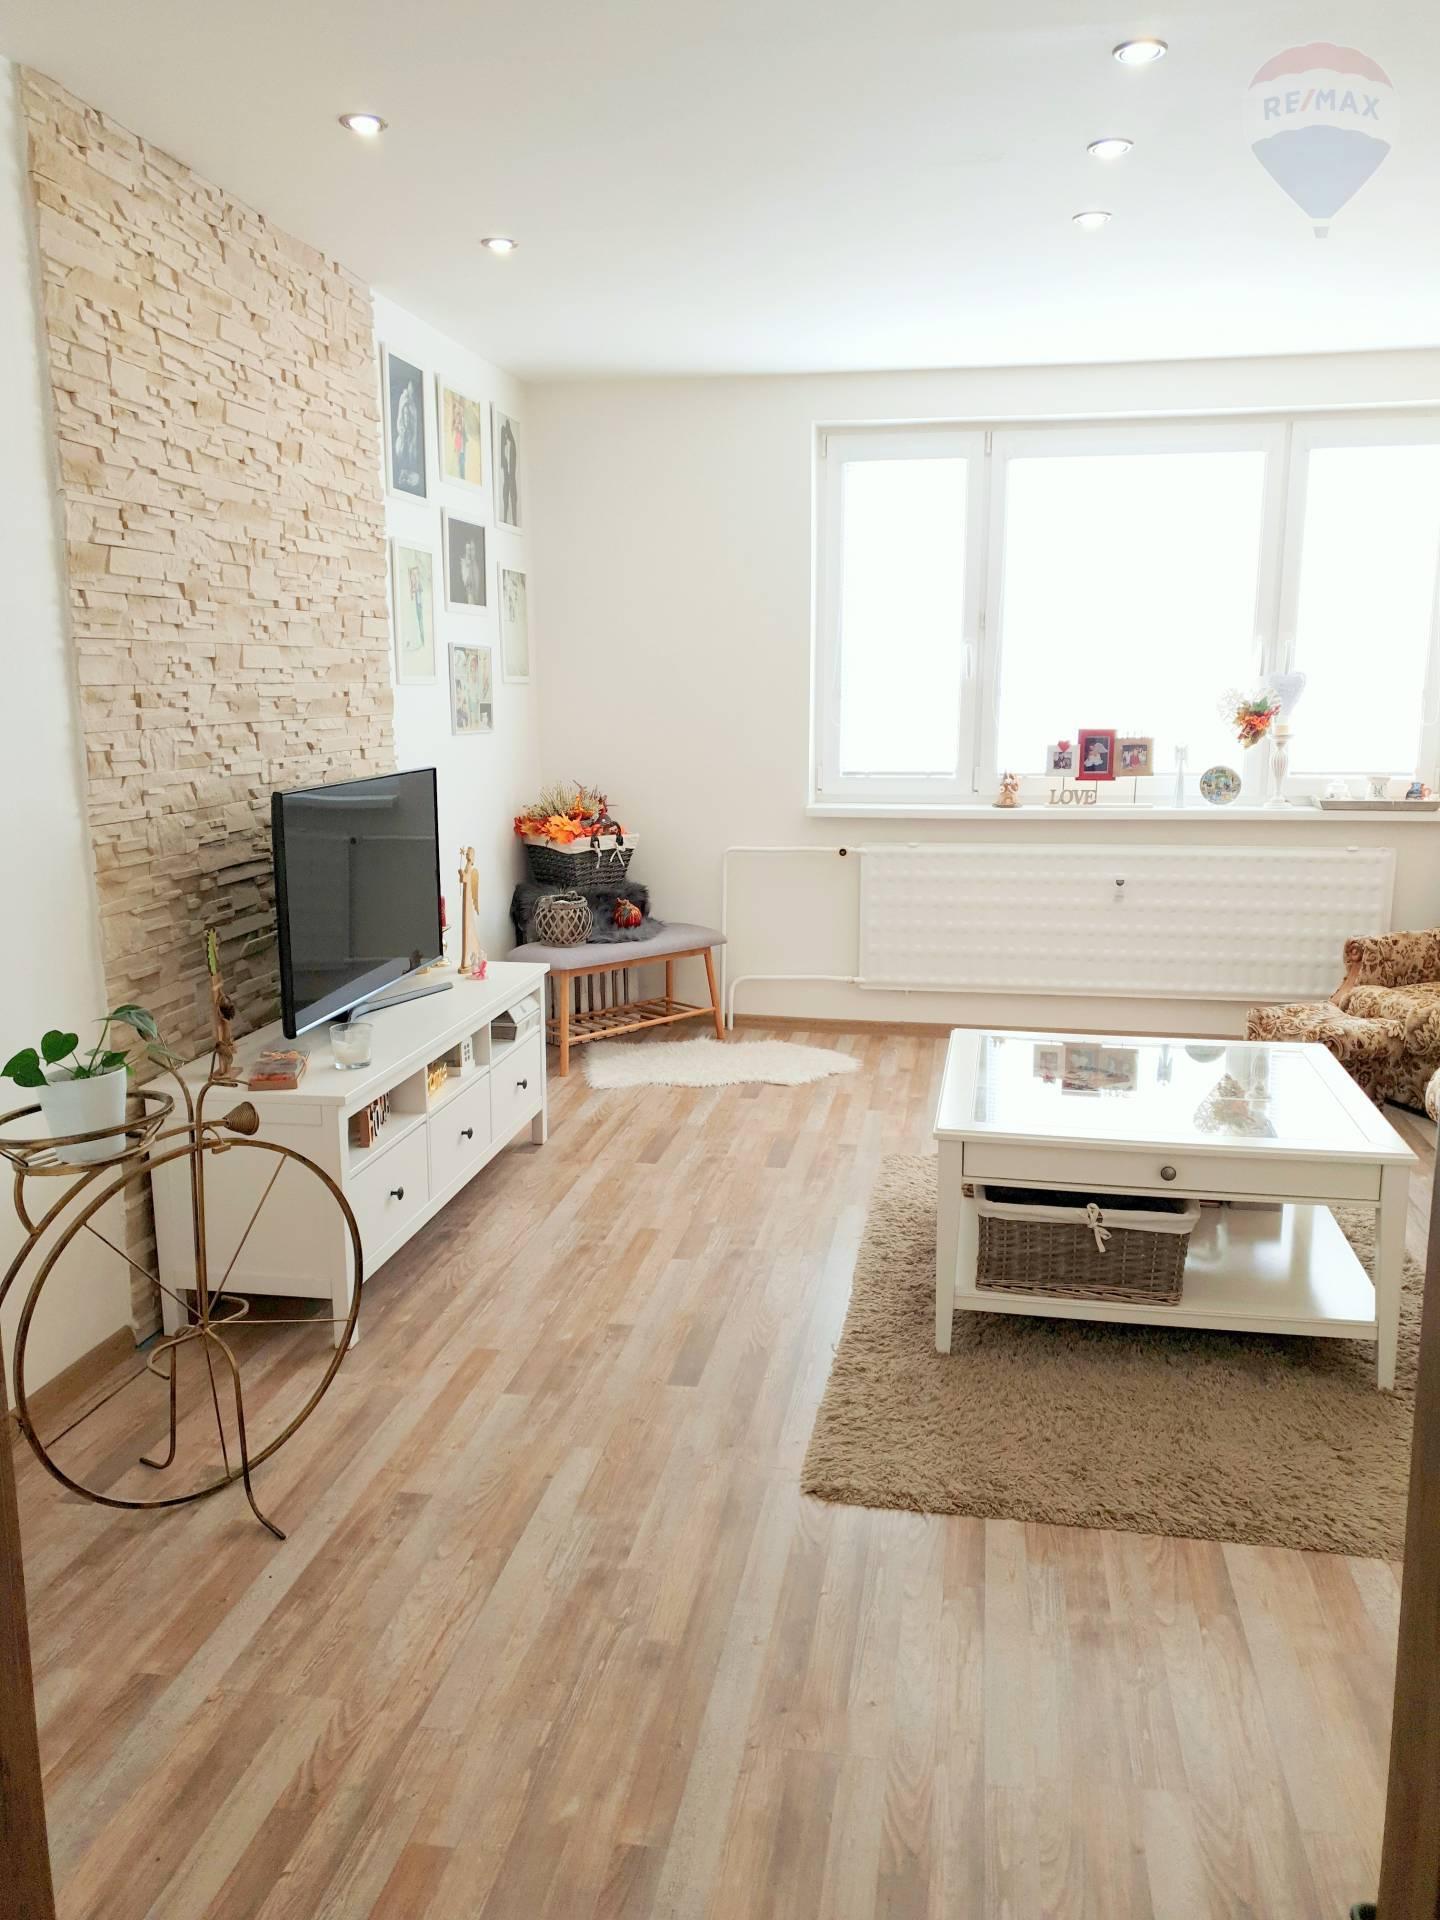 3 - izbový byt po nadštandardnej kompletnej rekonštrukcii